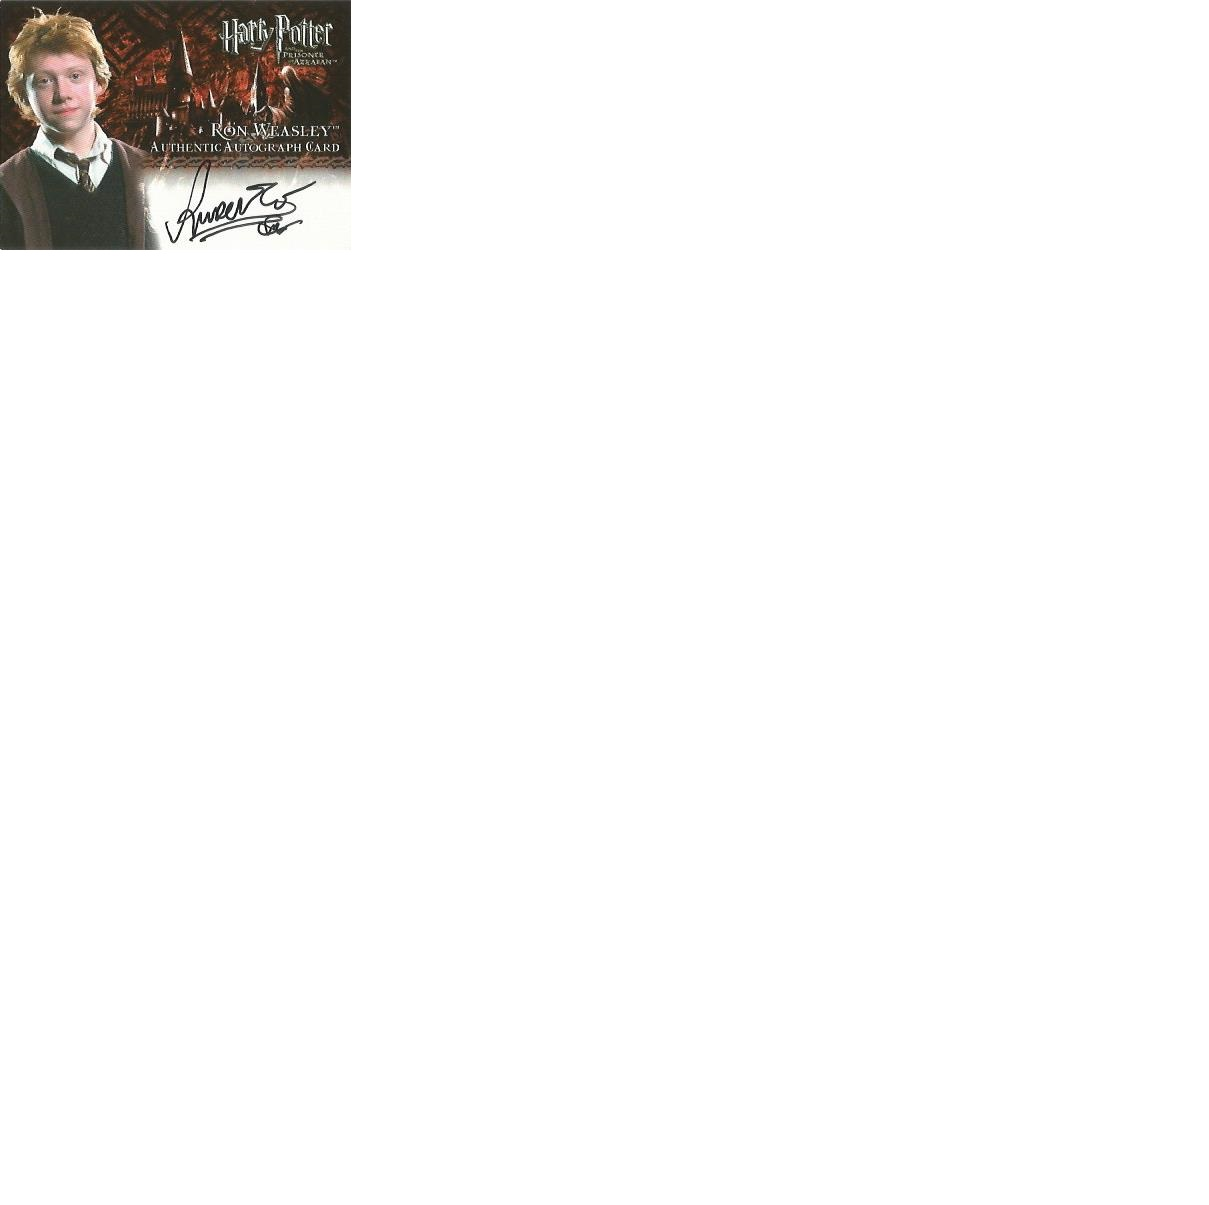 Lot 64 - Rupert Grint as Ron Weasley signed Harry Potter Prisoner of Azkaban autographed Artbox trading card.